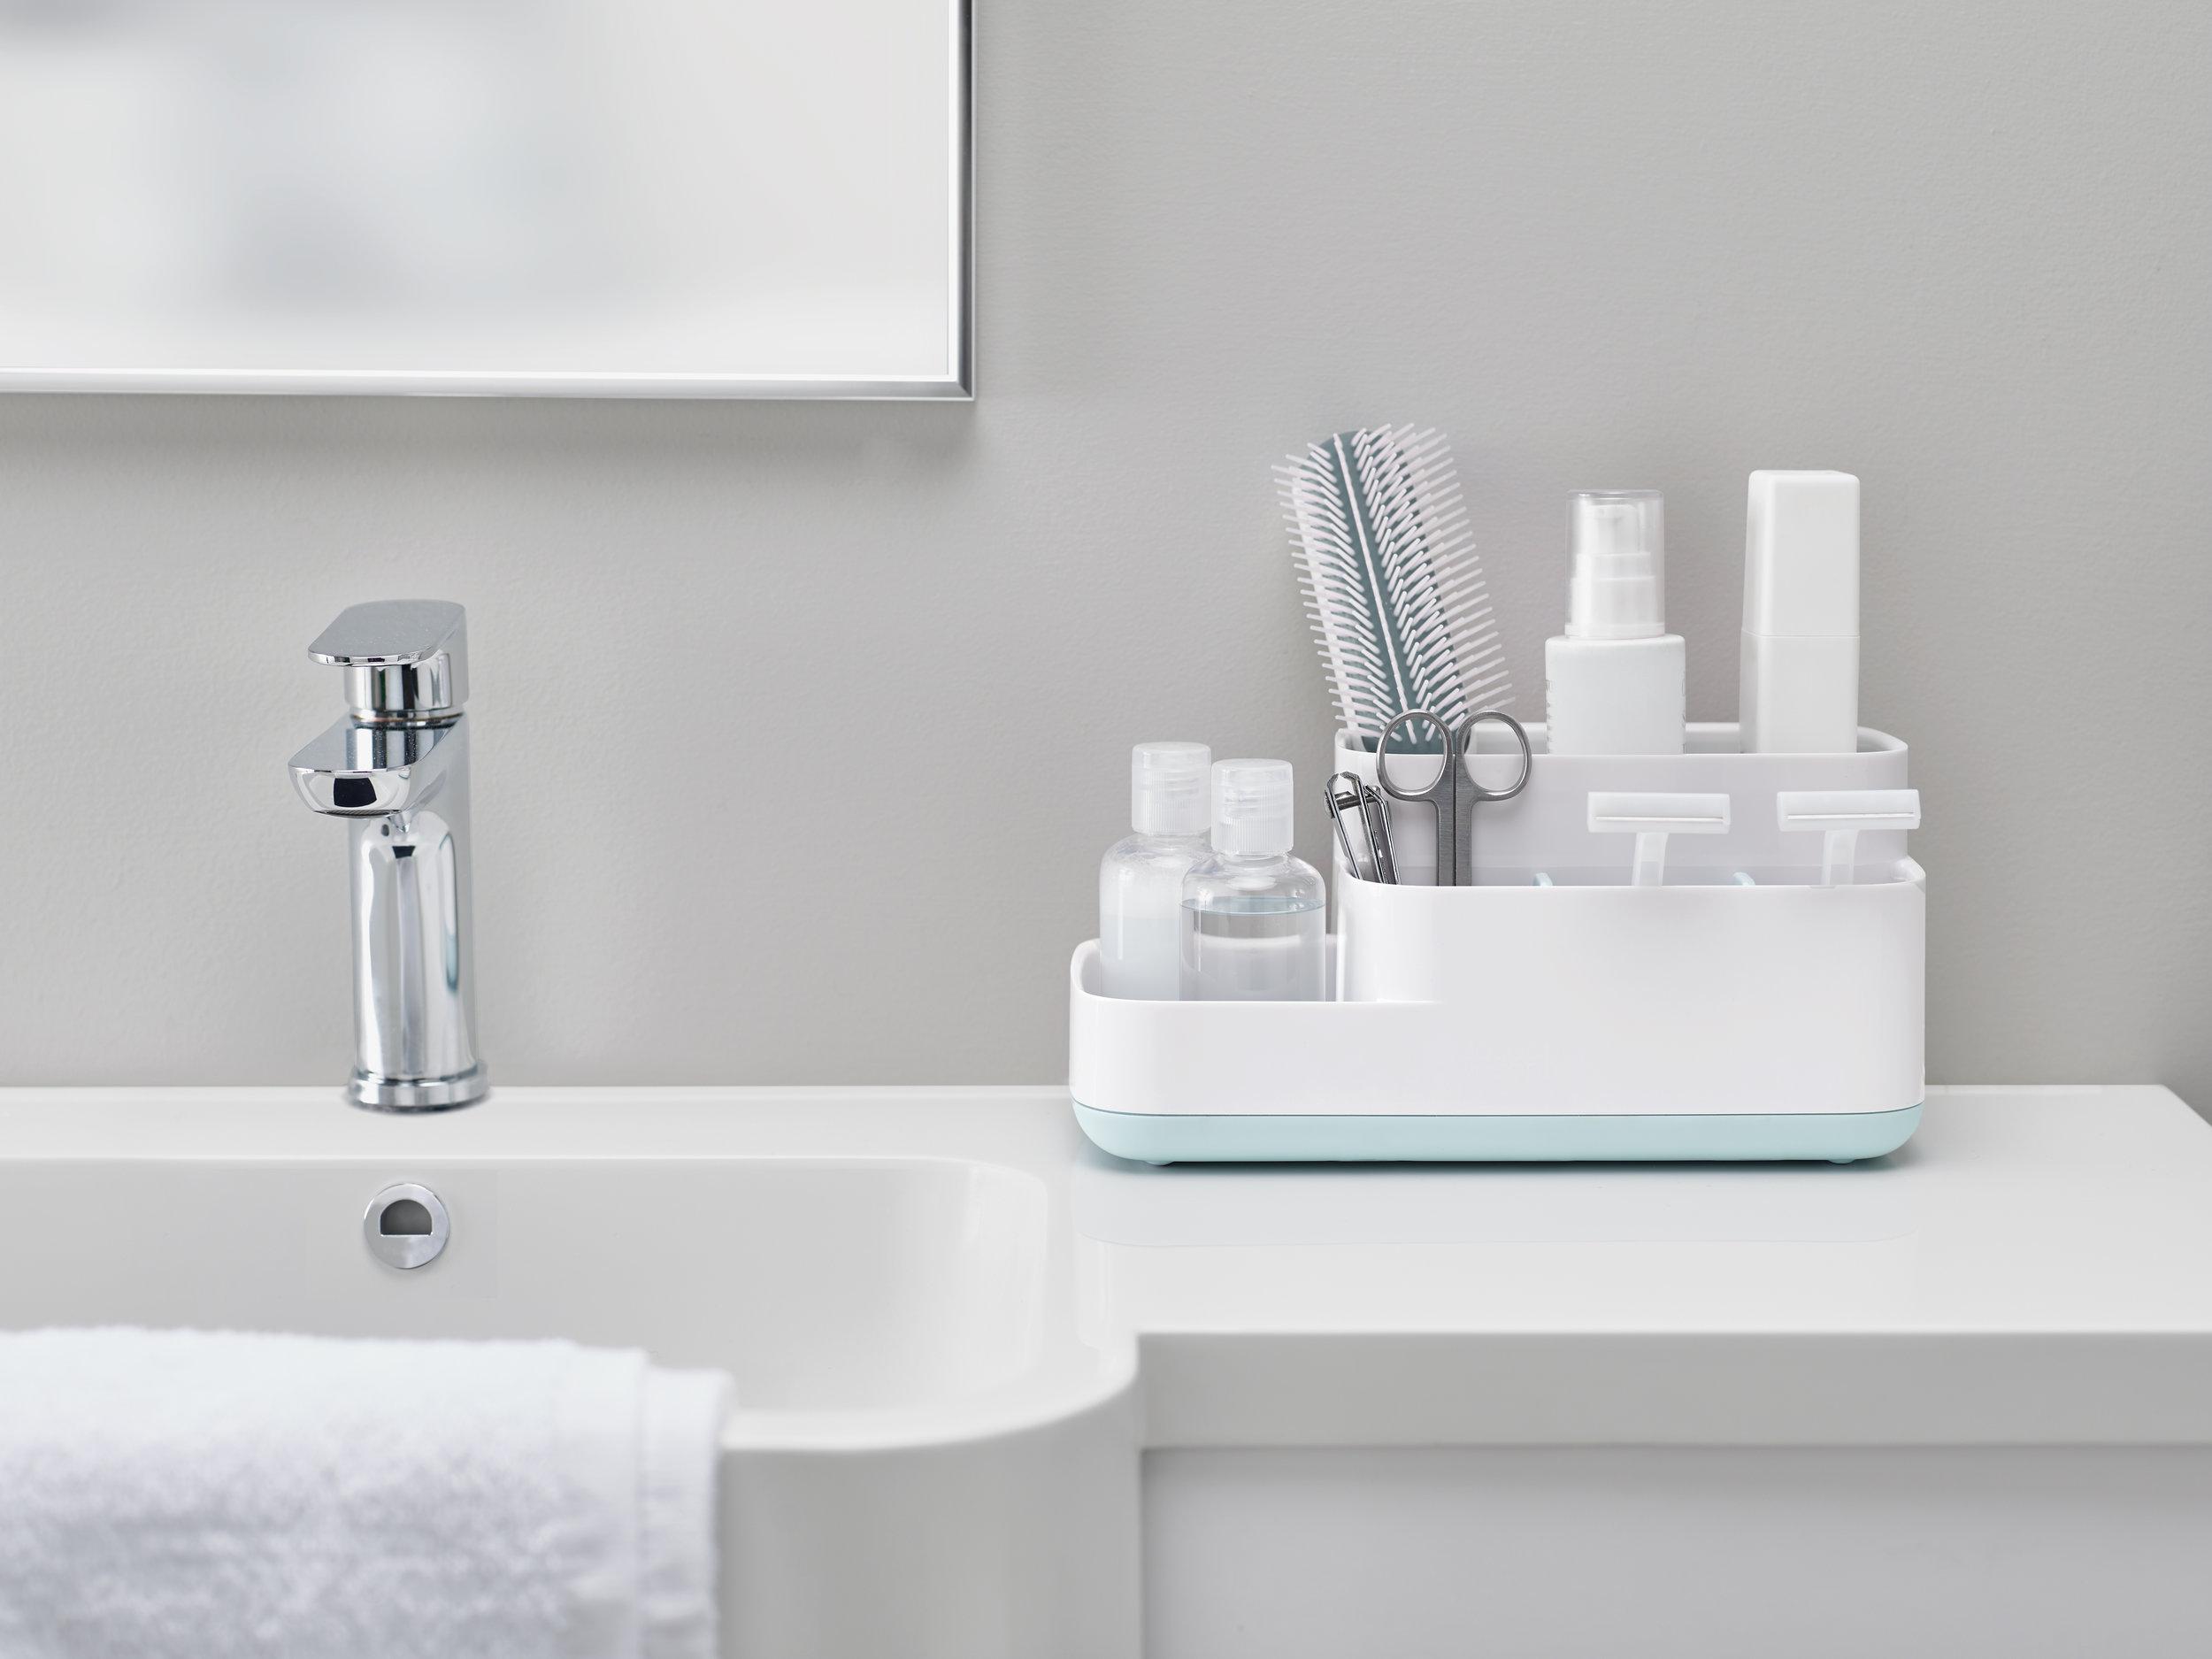 Studio Wood - JJ Bathroom Caddy Product Design 04